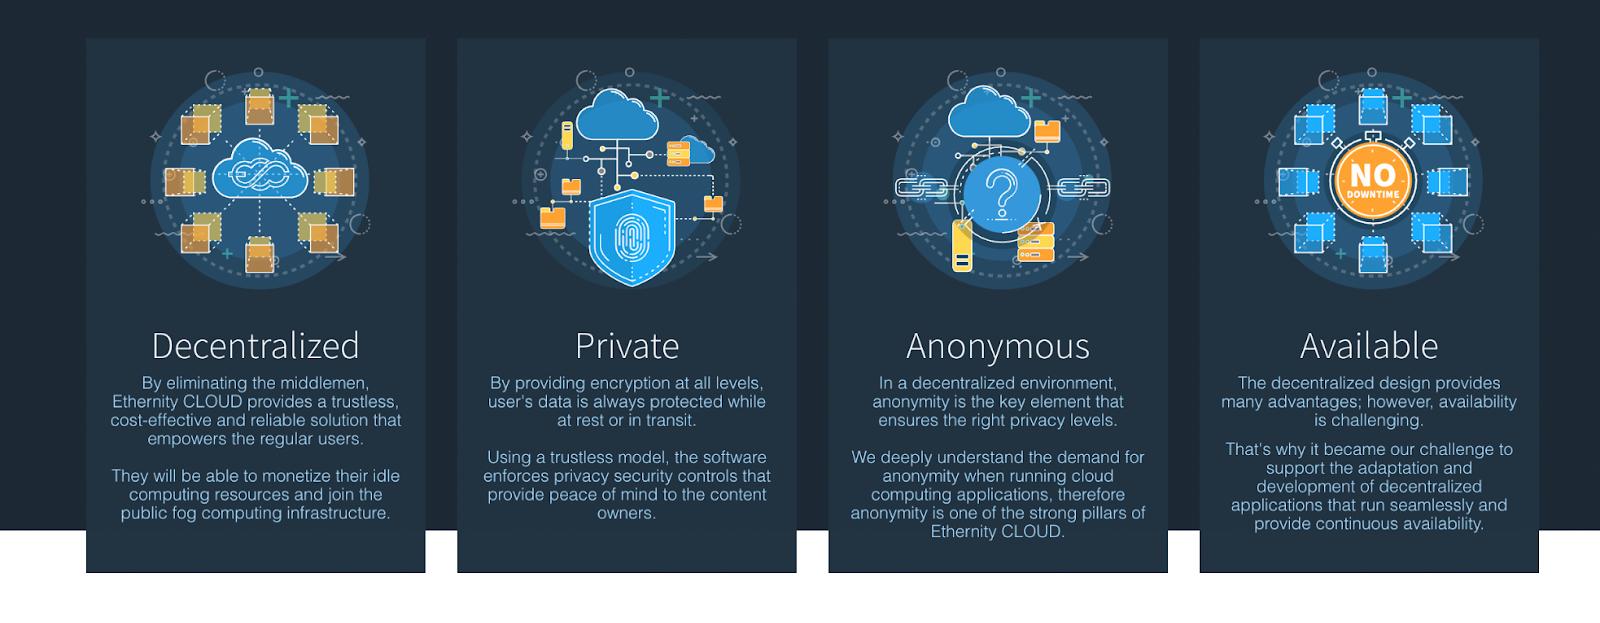 Ethernity CLOUD — Guaranteed Cloud Computing Security